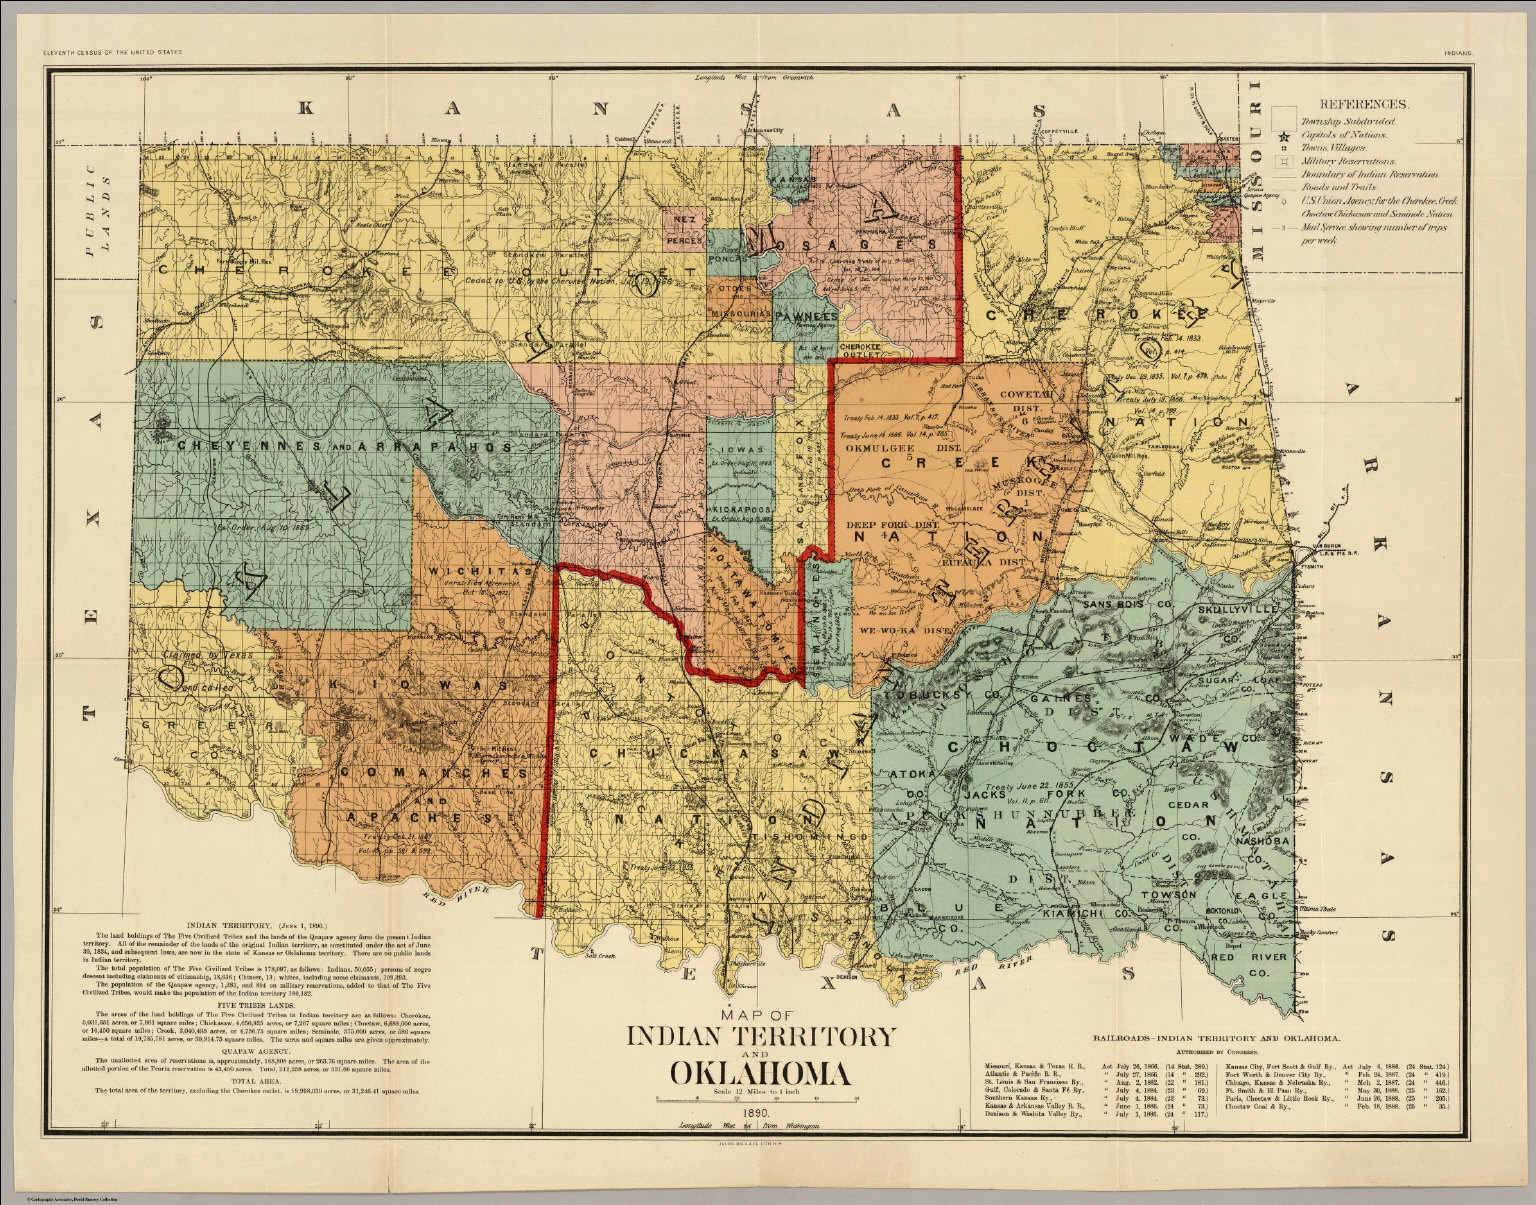 oklahoma indian territory1890 24